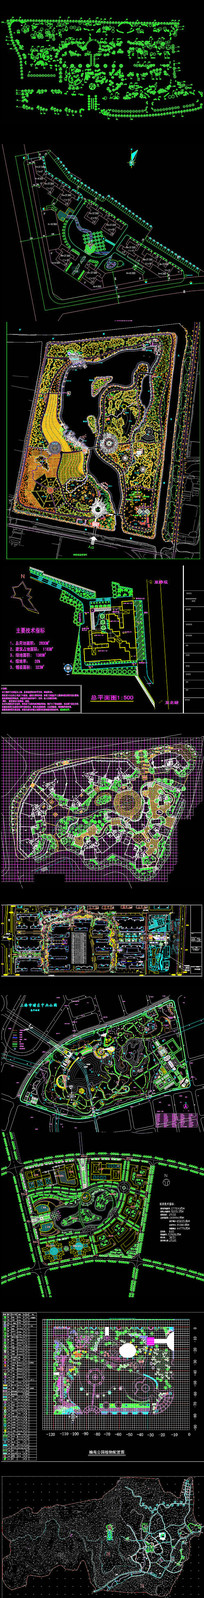 CAD公园规划图纸